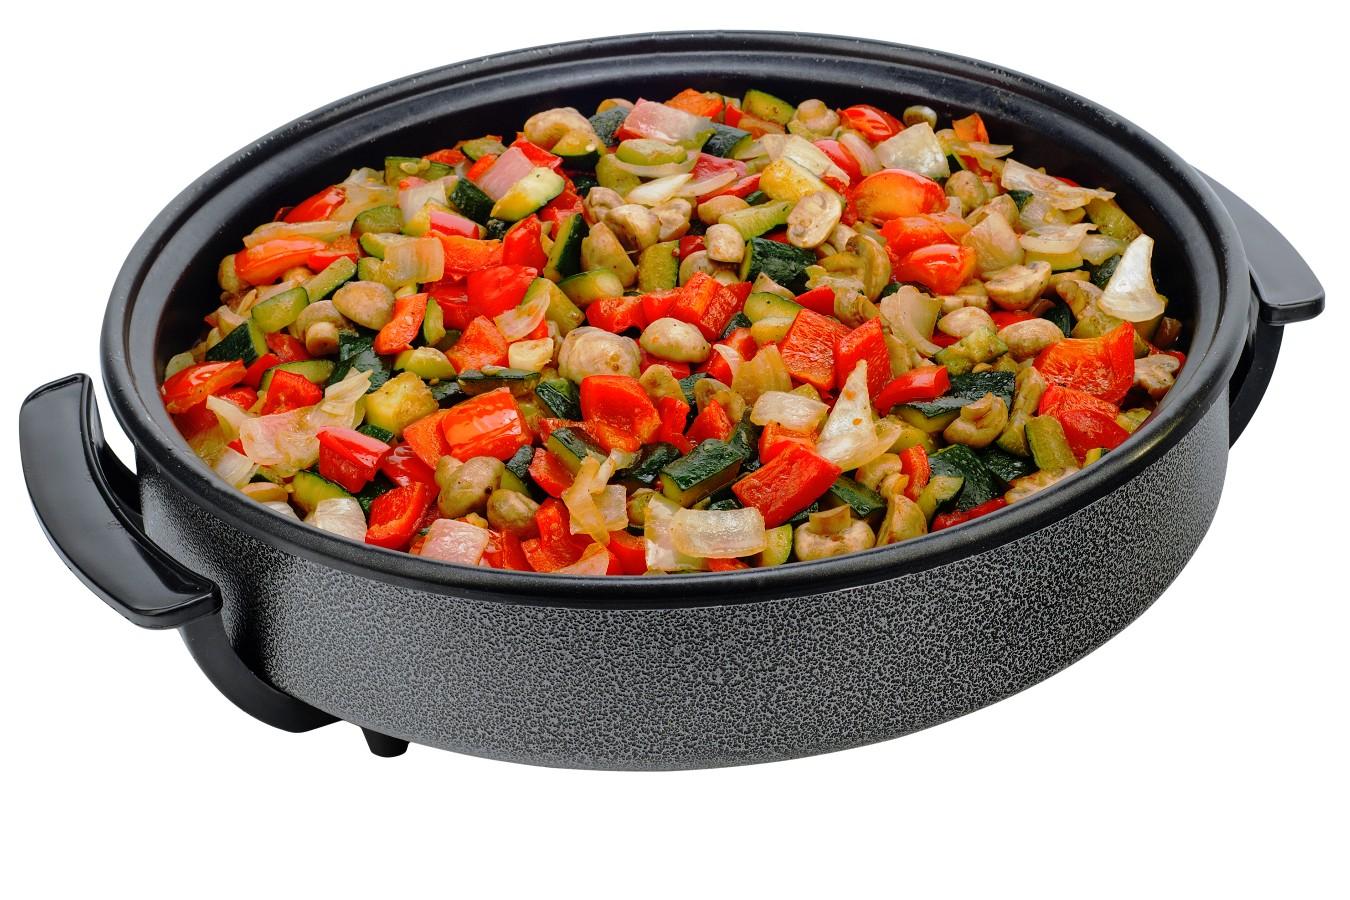 Ratatoulle-Gemüse